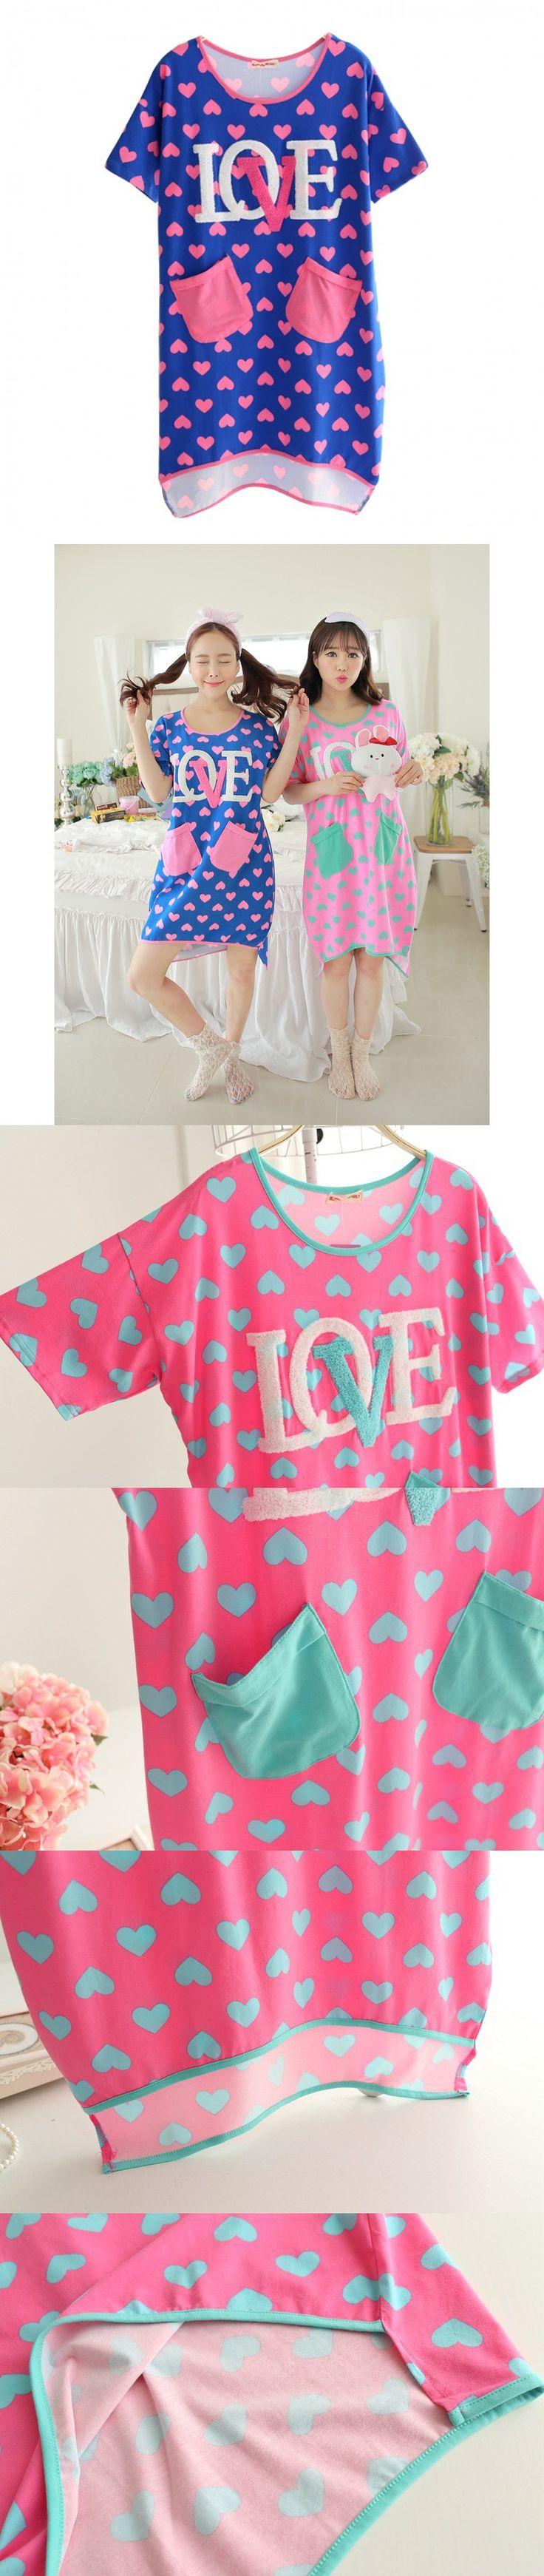 Hot Cute Cartoon Love Lingerie Nightdress Lady's Short Sleeve Cotton Robe Sleepwear Women Sleep Dress Girls Nightgown Sleepshirt